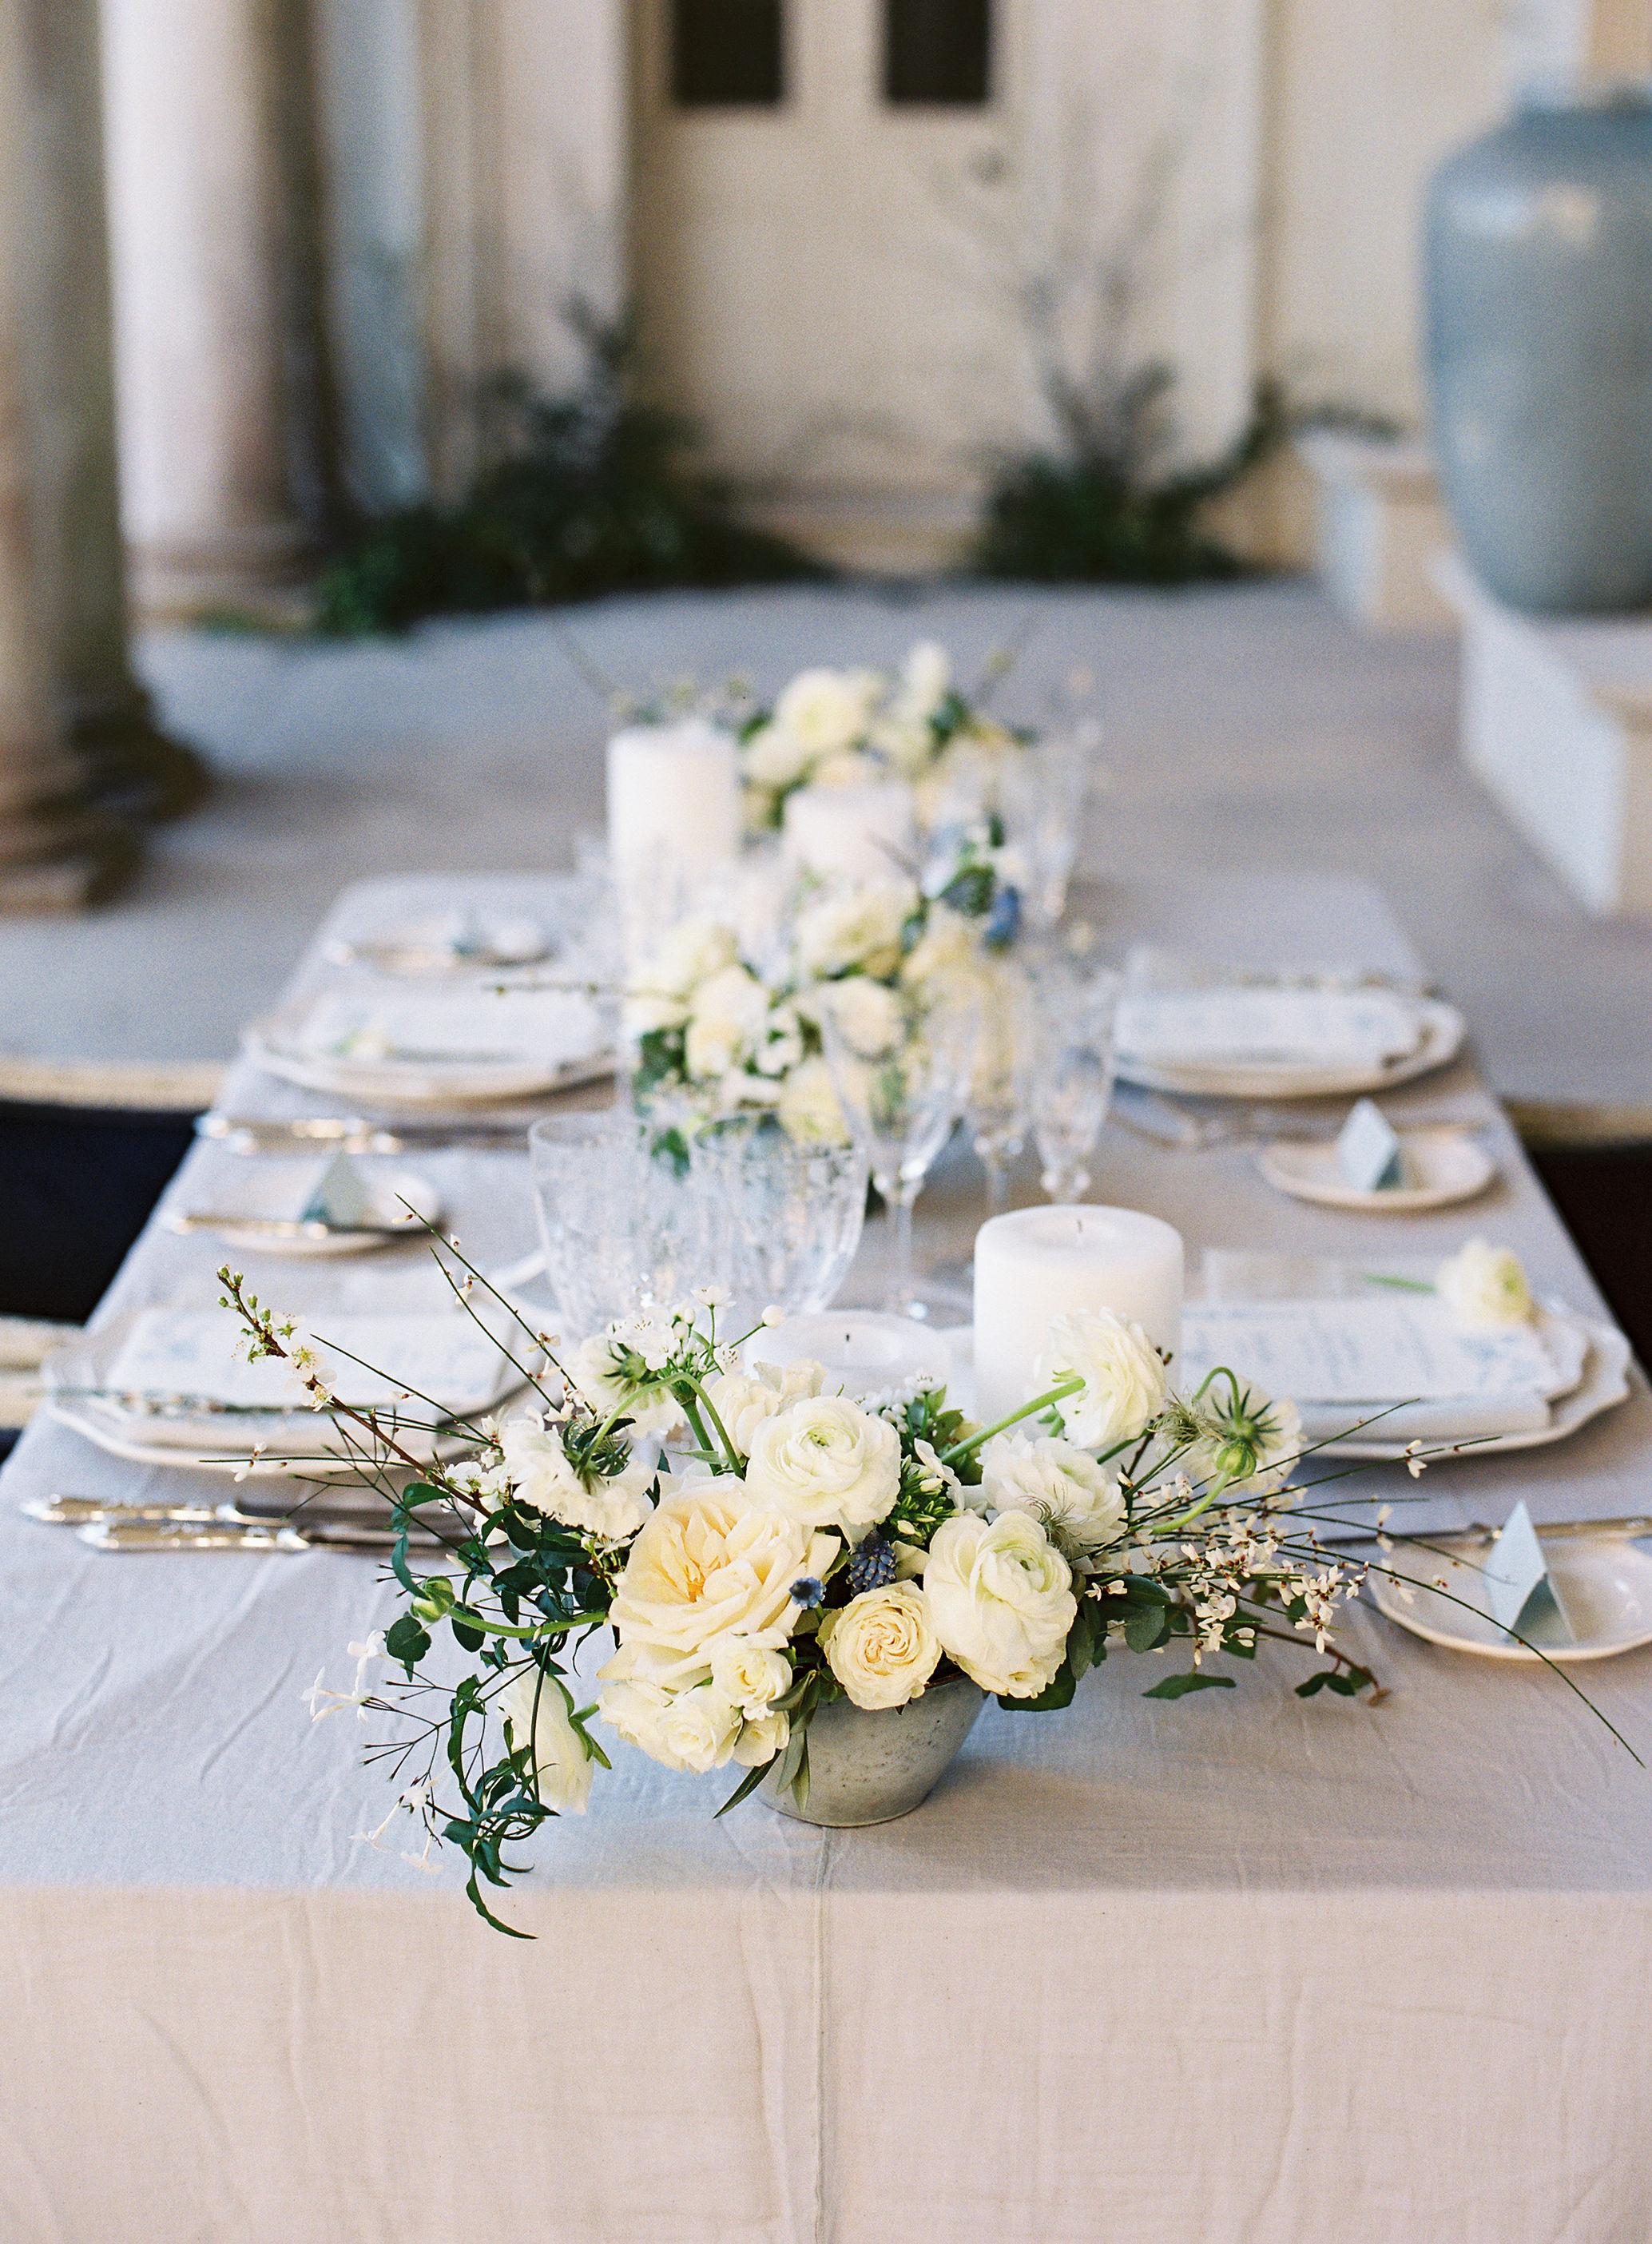 The Timeless Stylist-A Forgotten Love Story-Fine Art Wedding Editorial-Heirloom Wedding Styling 52.jpg